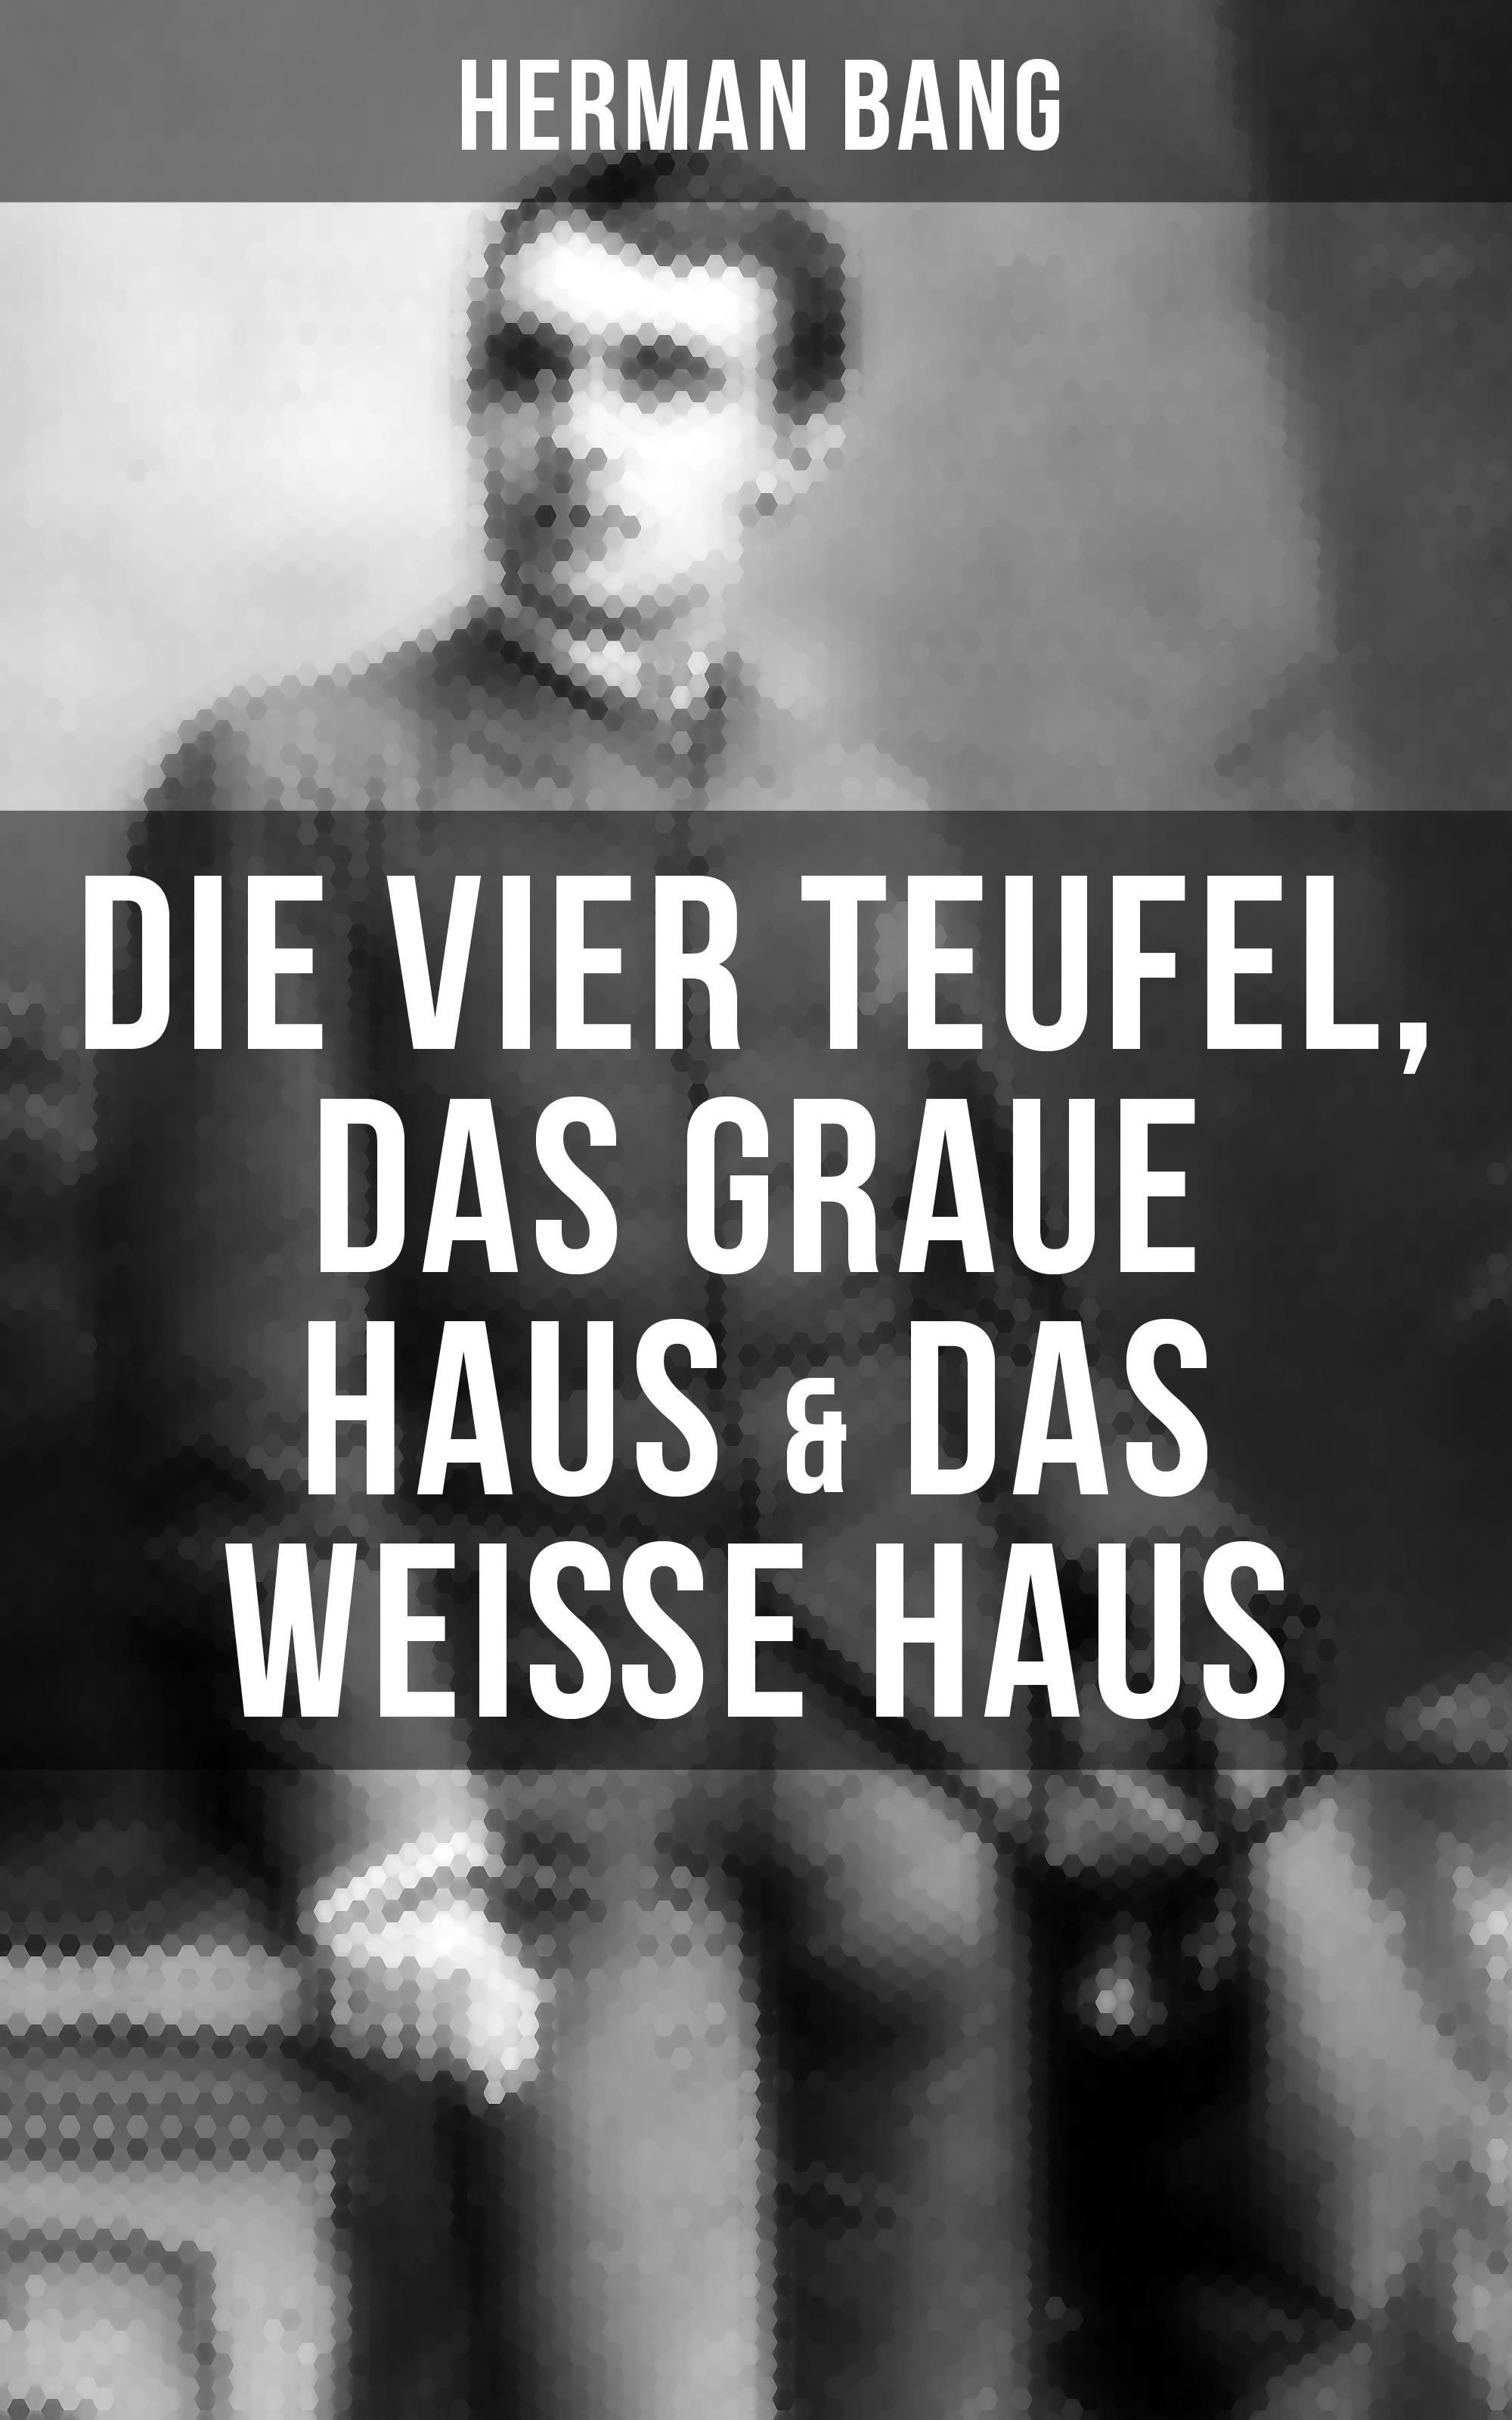 Herman Bang Herman Bang: Die vier Teufel, Das graue Haus & Das weiße Haus бейсболка herman 1874 herman 1874 he017cubefa9